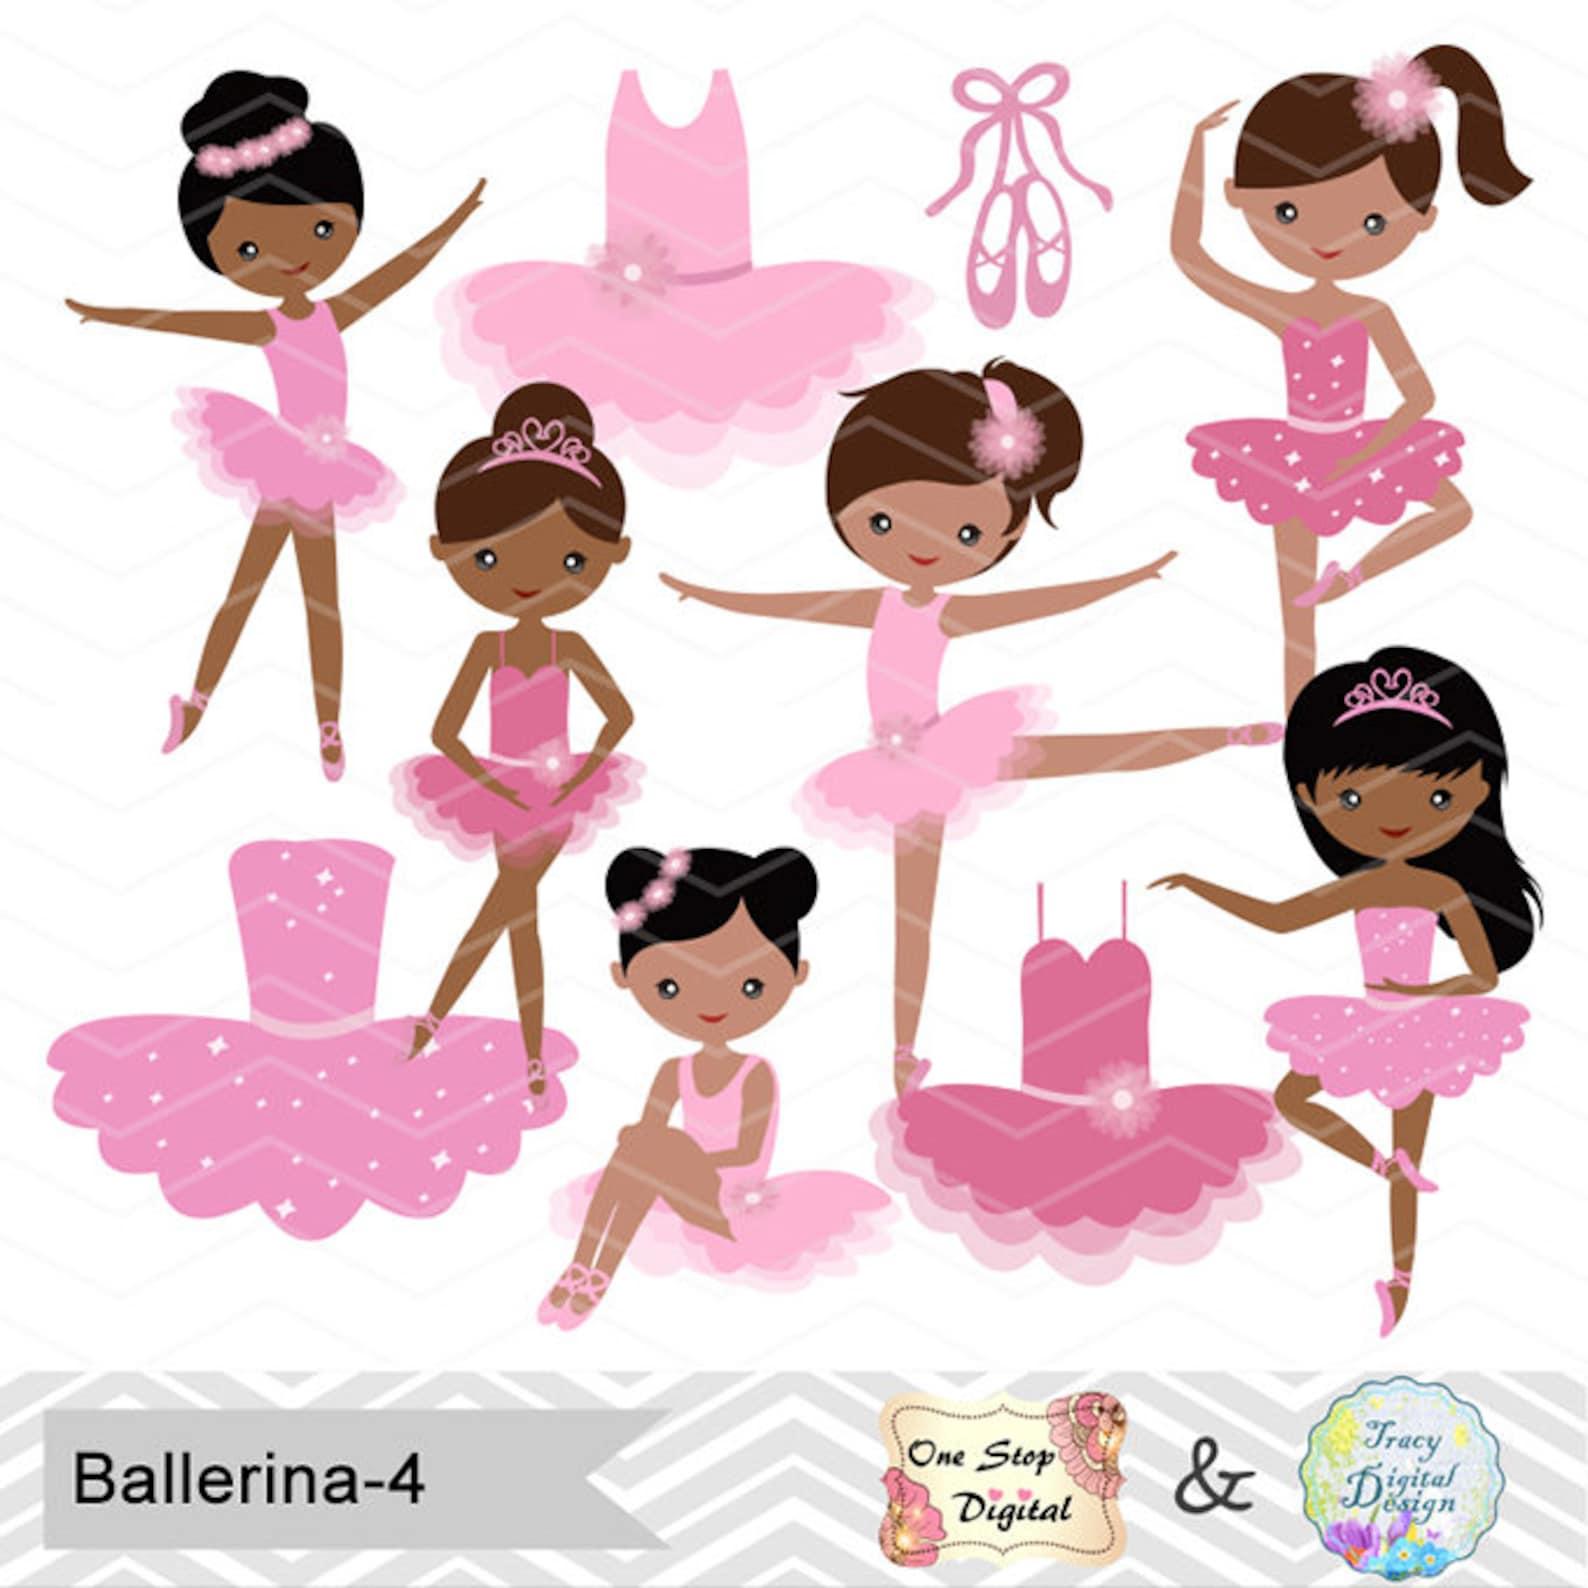 african american ballerina digital clip art, ballet clipart, pink ballet african american girls clip art, pink ballet shoes dres